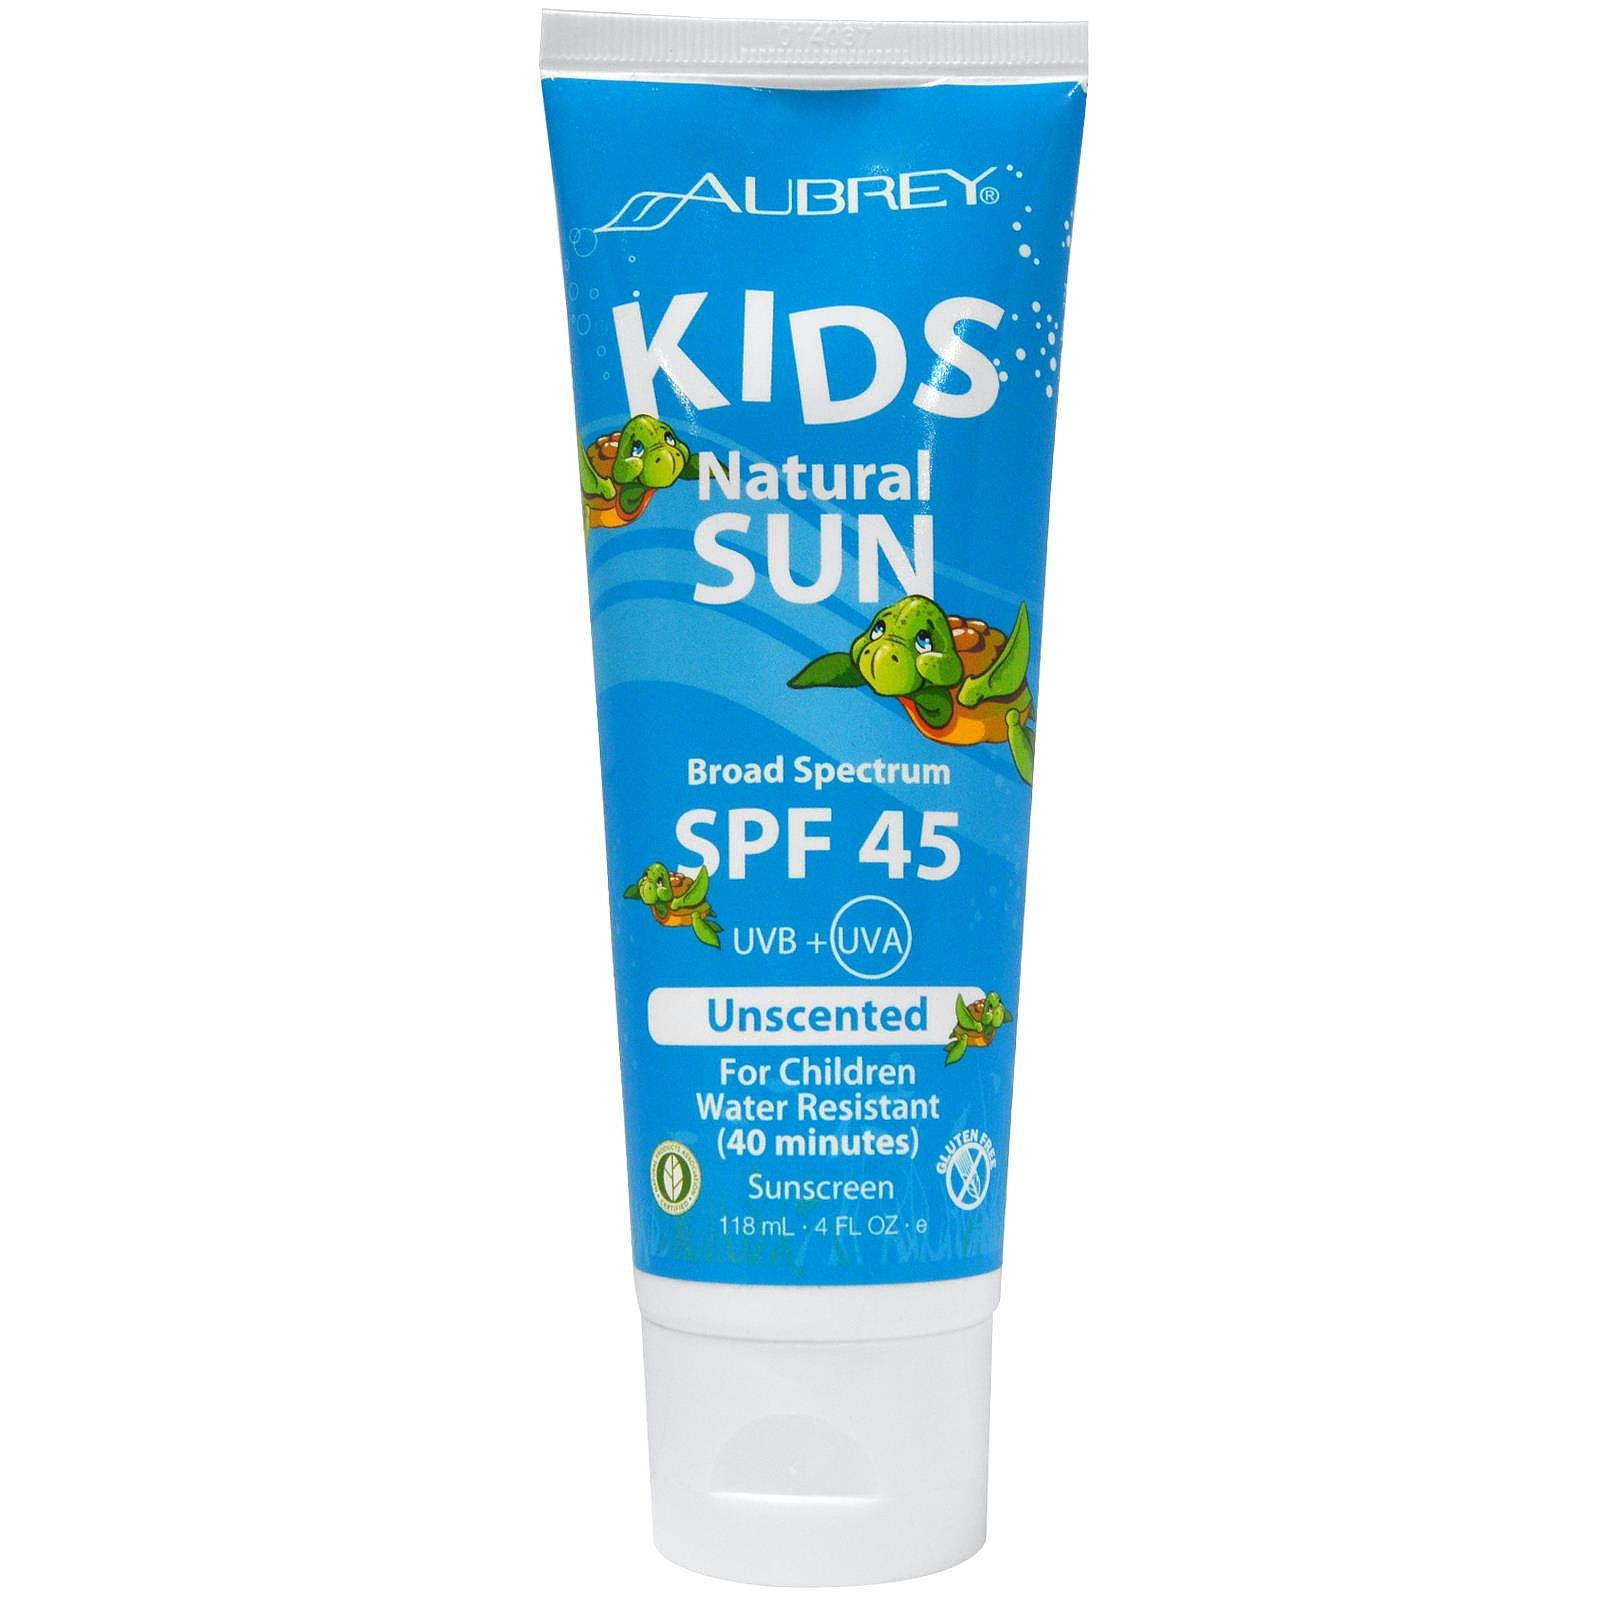 Health Food Store Find: Aubrey Organics Natural Sun Sunscreen For Kids, Unscented, SPF 45